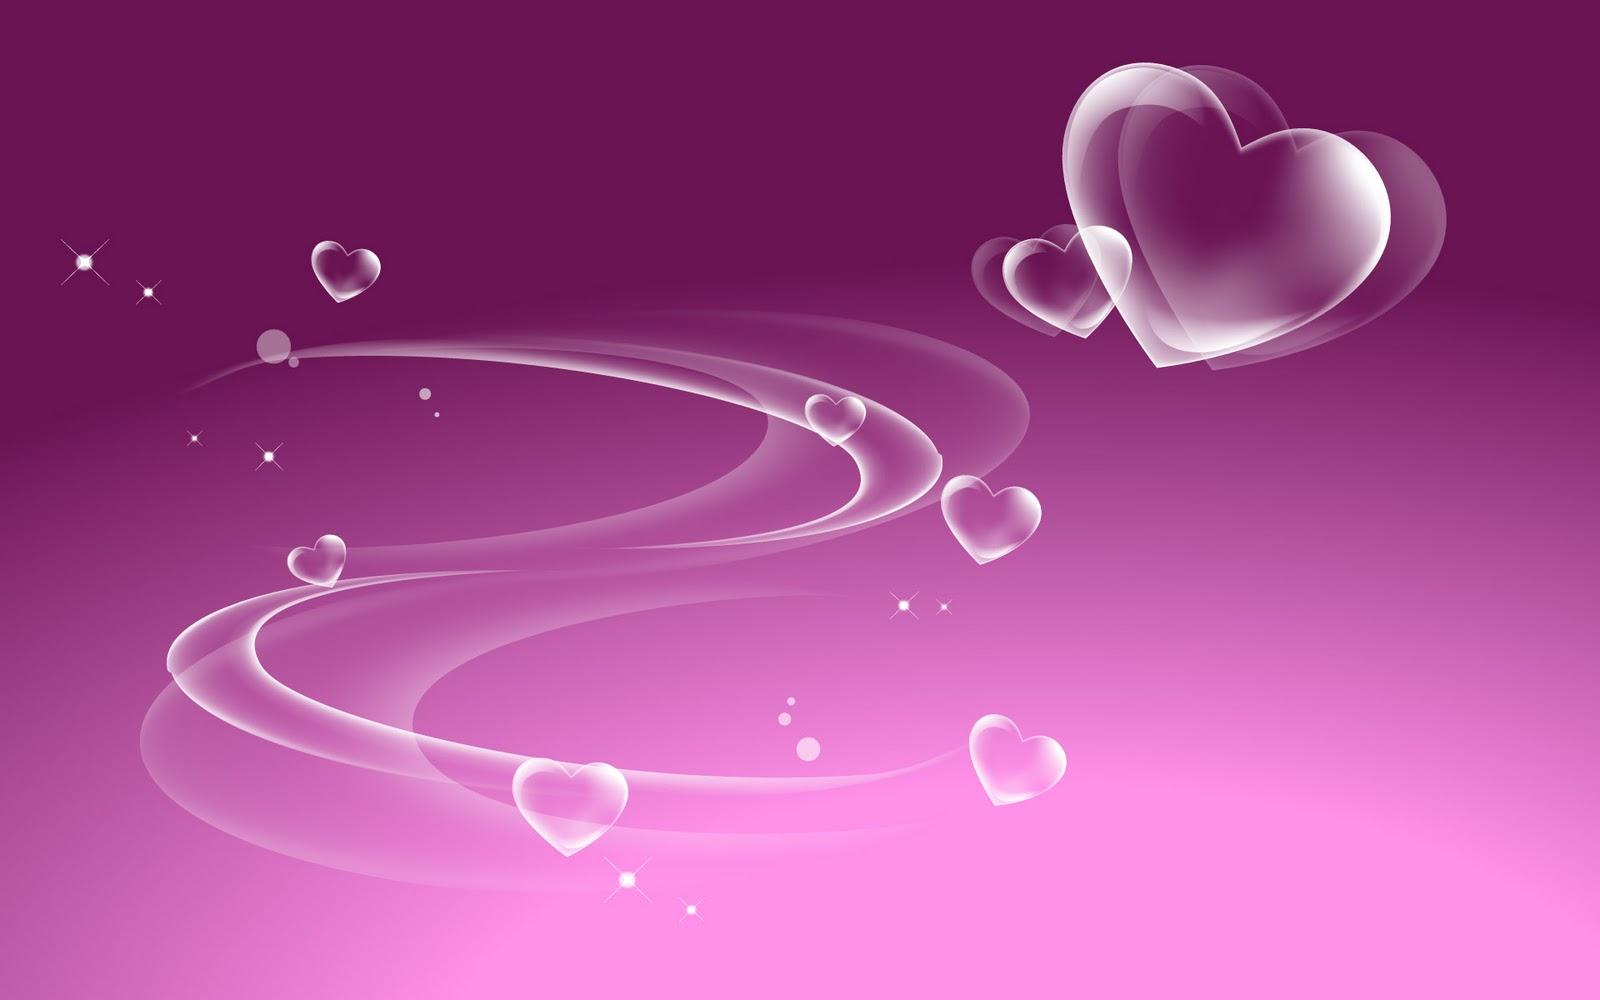 wallpaper download valentine screensavers image gallary 1600x1000